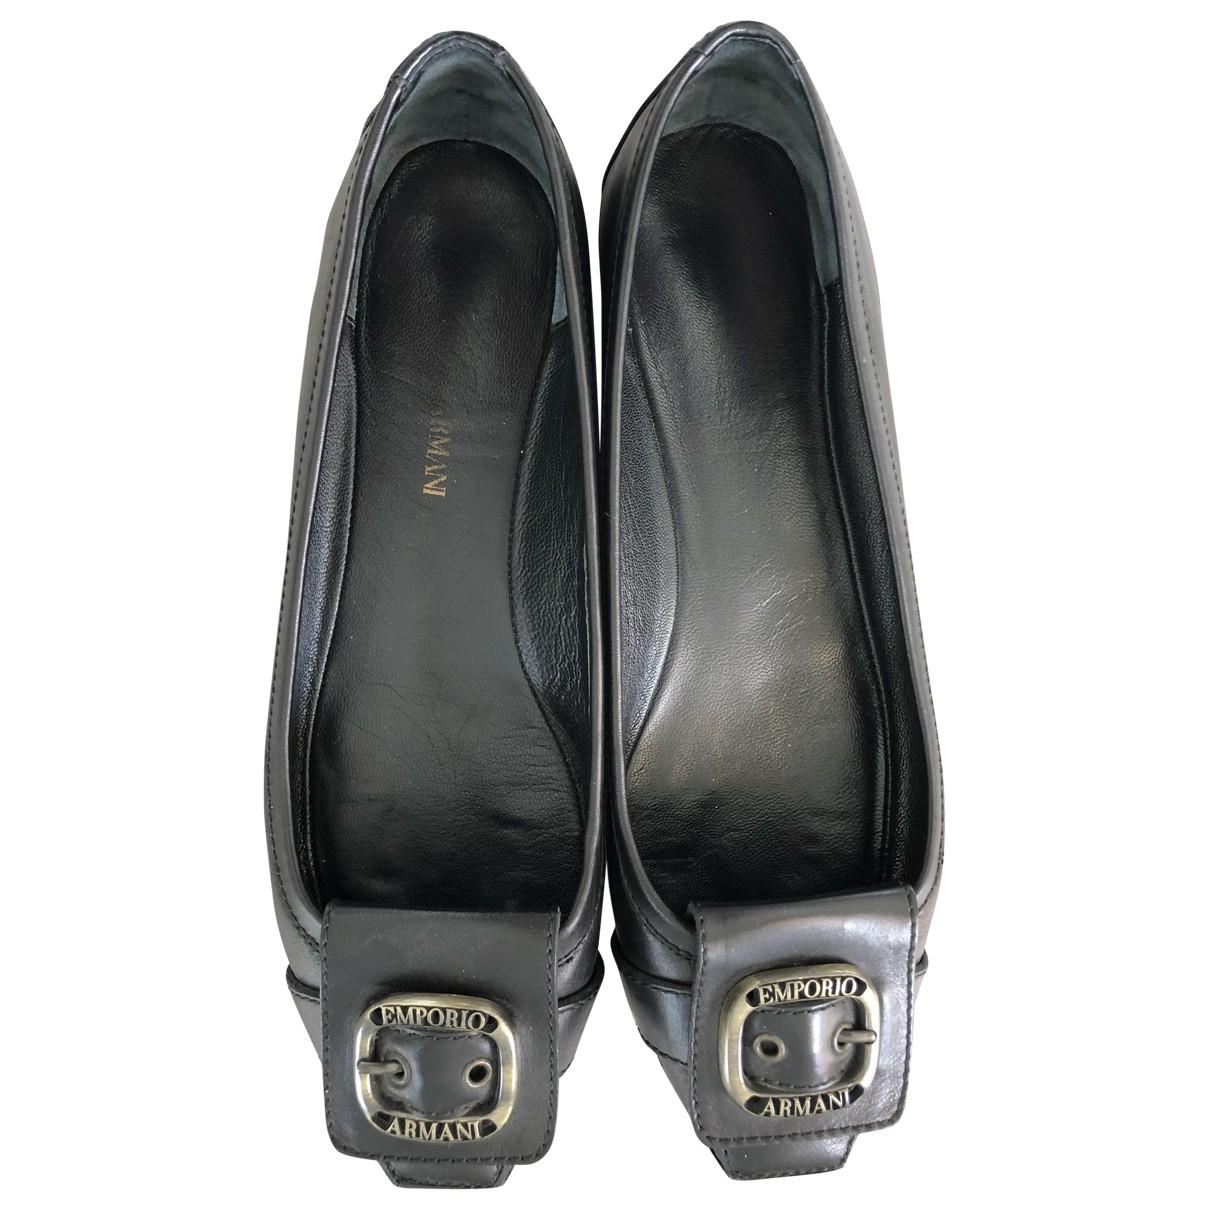 Emporio Armani - Ballerines   pour femme en cuir - noir